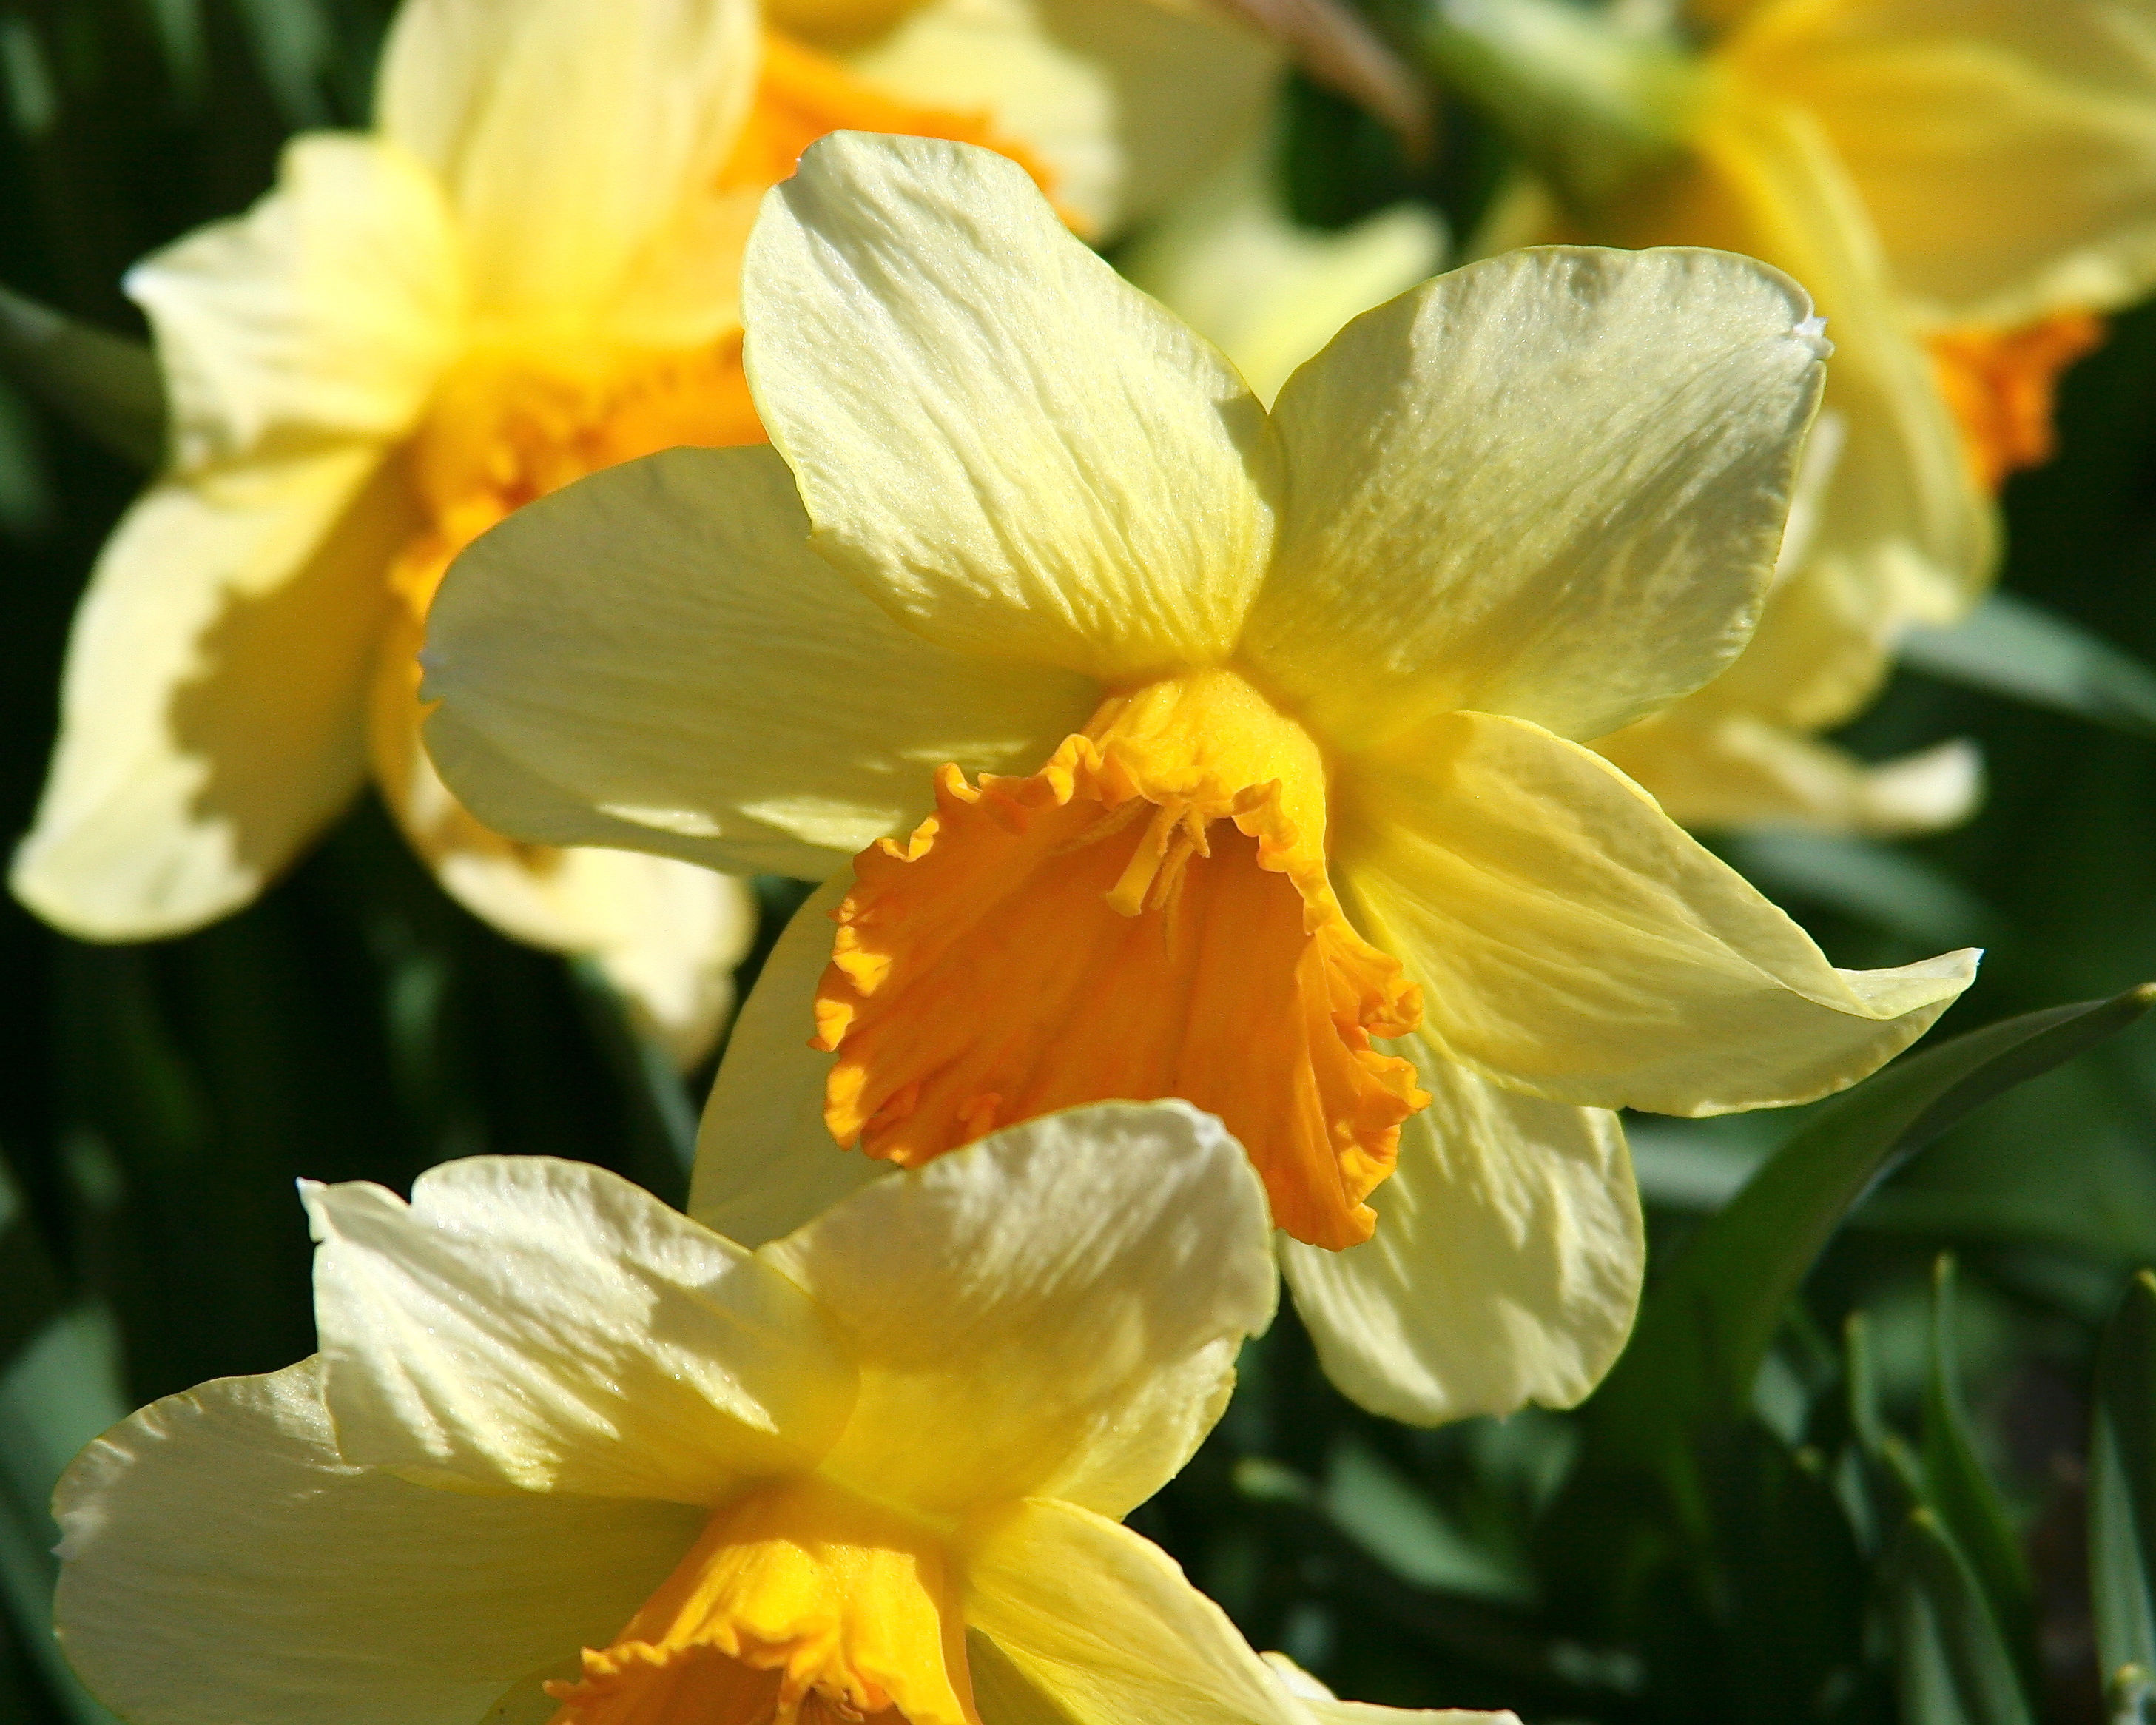 Yellow Daffodils Song Daffodils Copy